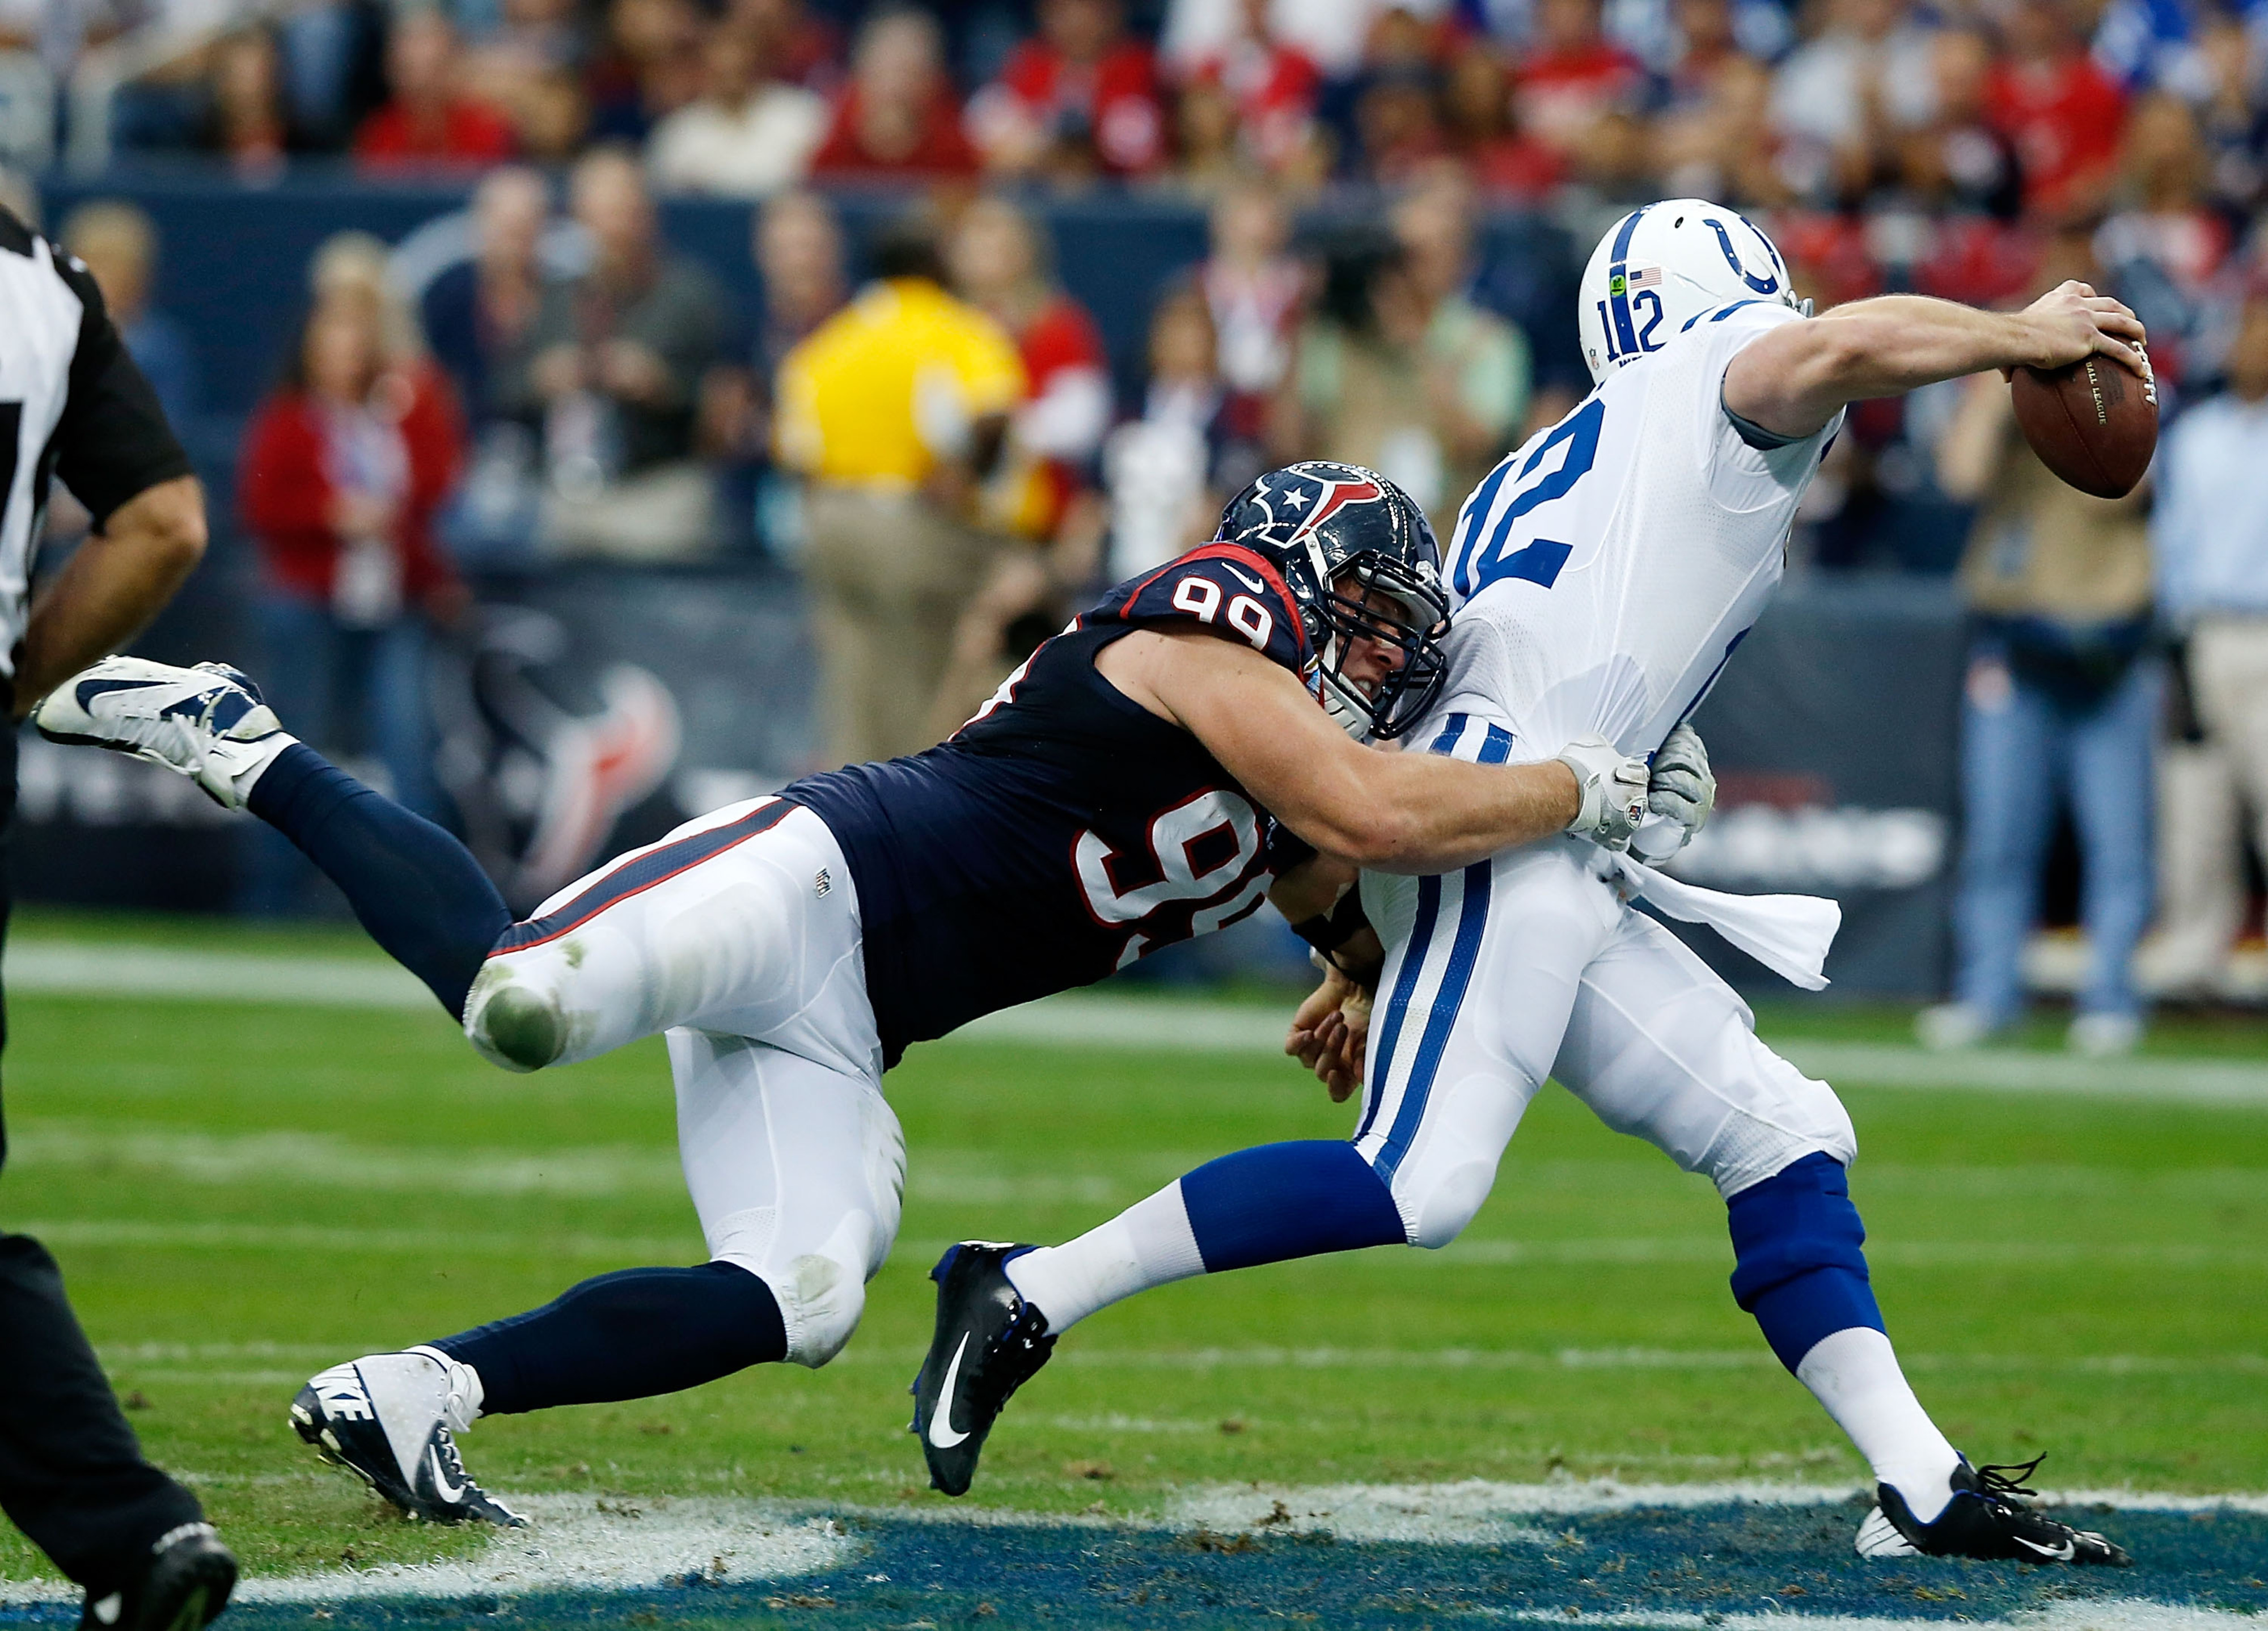 Houston's best versus Indianapolis' best.